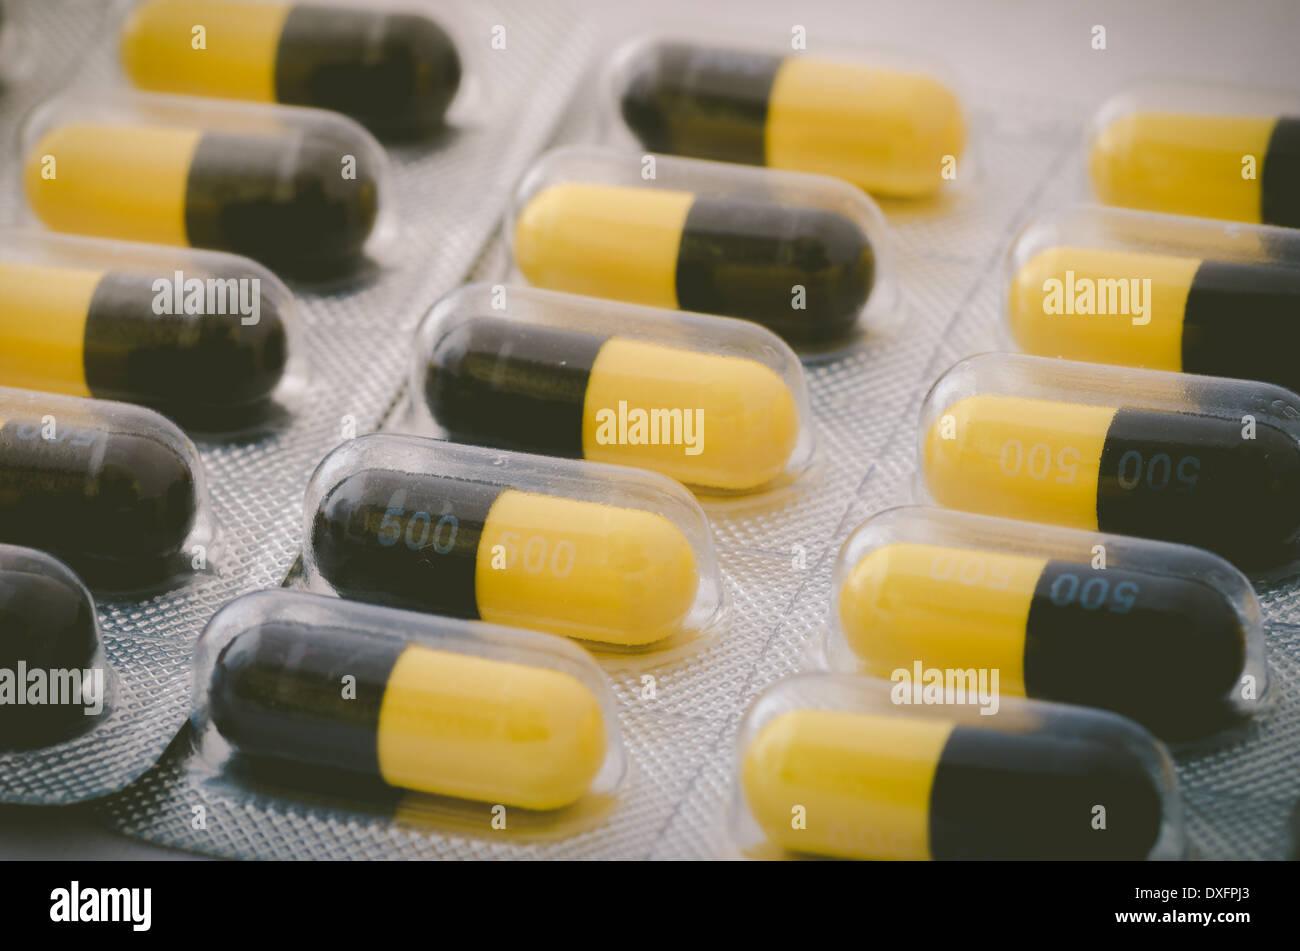 Schwarze und gelbe Kapsel Pack-Medizin-Heide-Konzept Stockbild